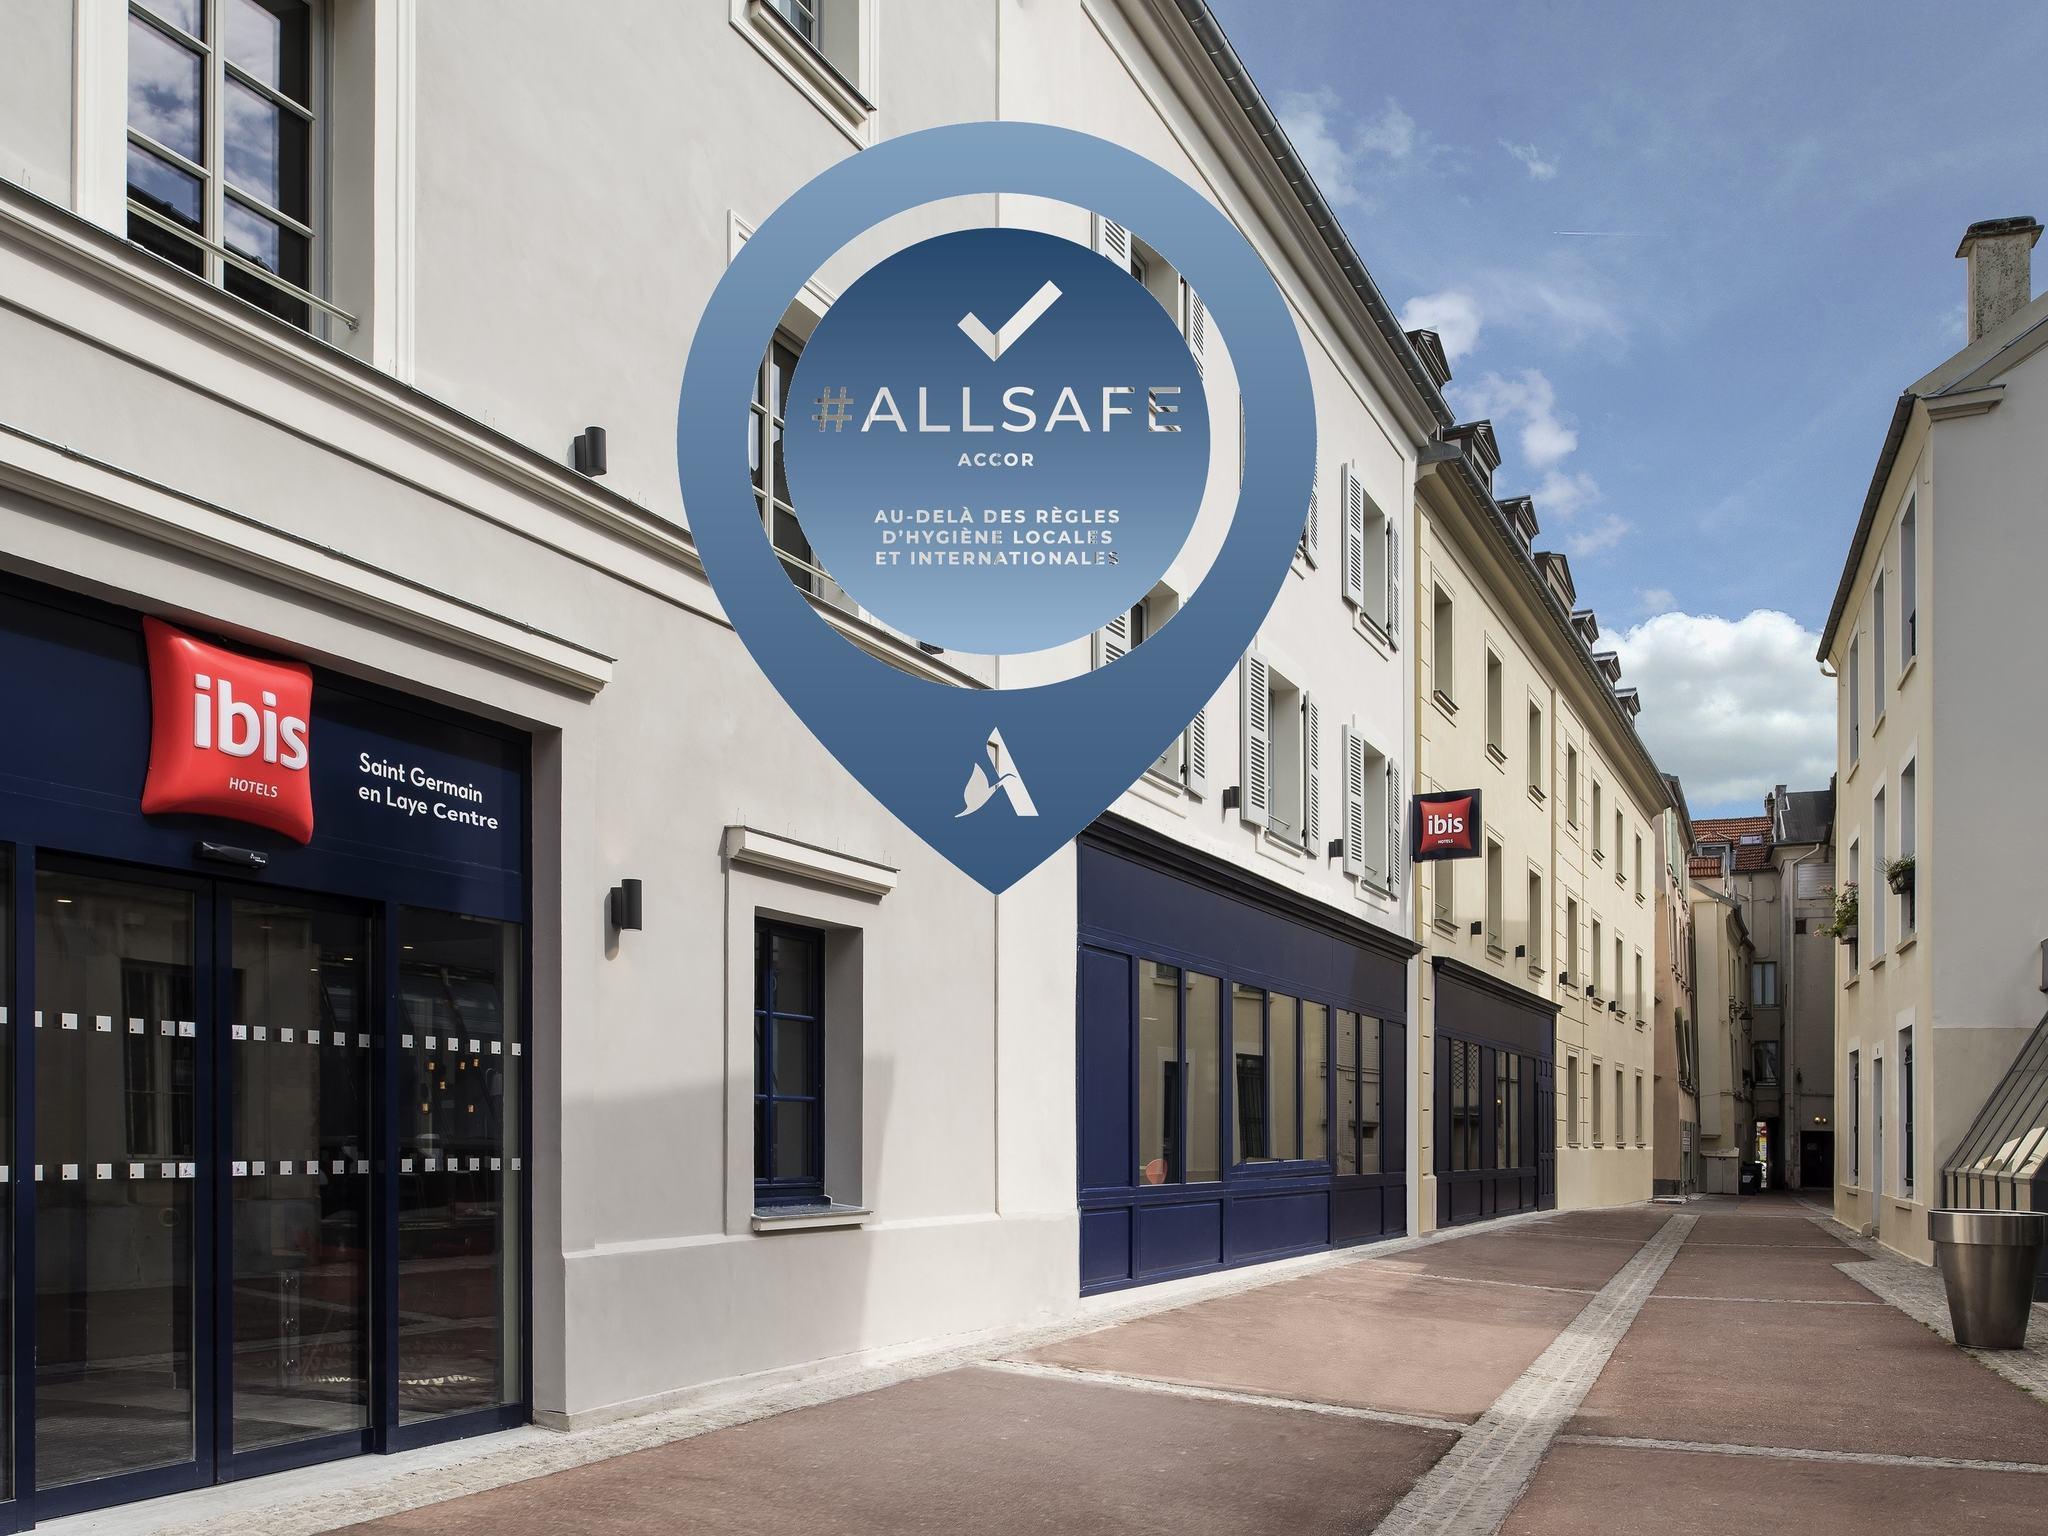 Hotel - ibis Saint Germain en Laye Centre